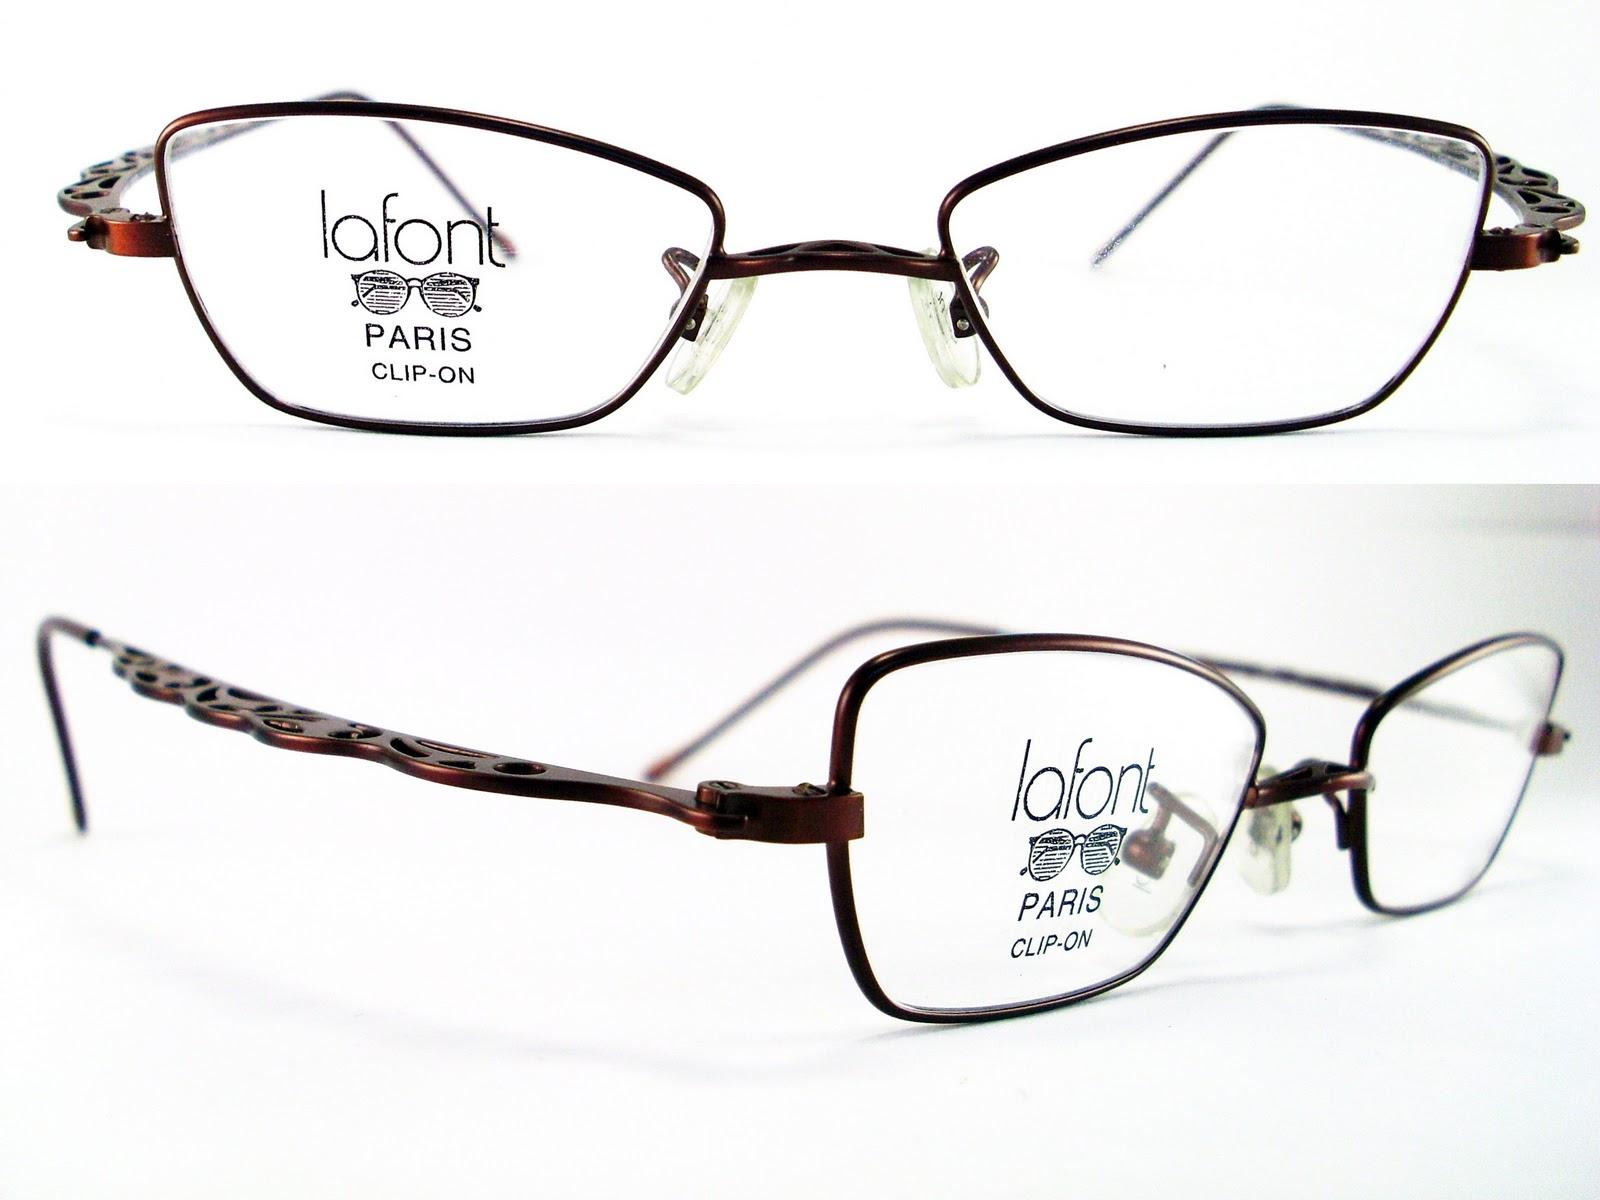 Jean lafont eyeglasses frames - Vintage Eyeglass Frame In Excellent Vintage Condition Total Width 4 5 8 Arms 5 3 4 Height 1 Lense Width 1 3 4 Size 43 14 Jean Lafont Paris